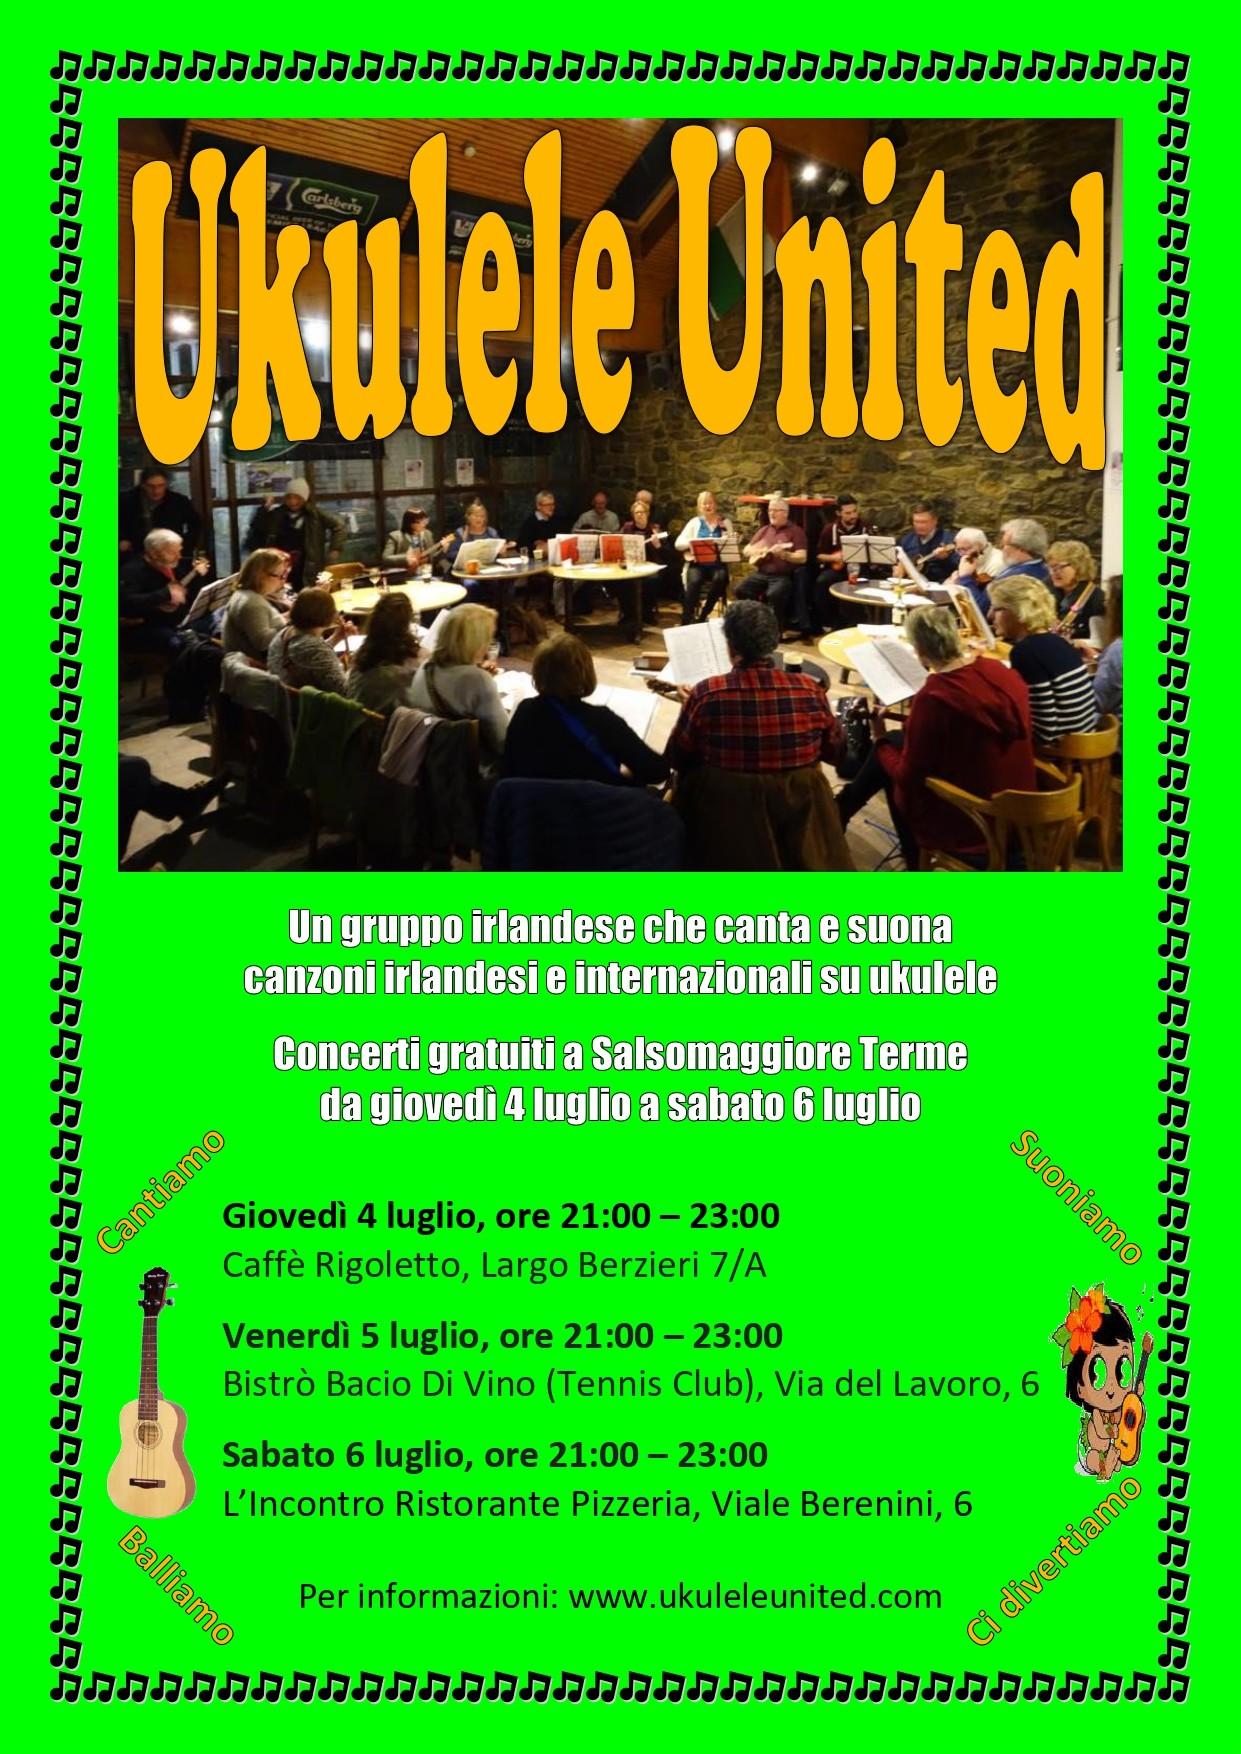 Ukulele United dall'Irlanda  alla Pizzeria L'Incontro